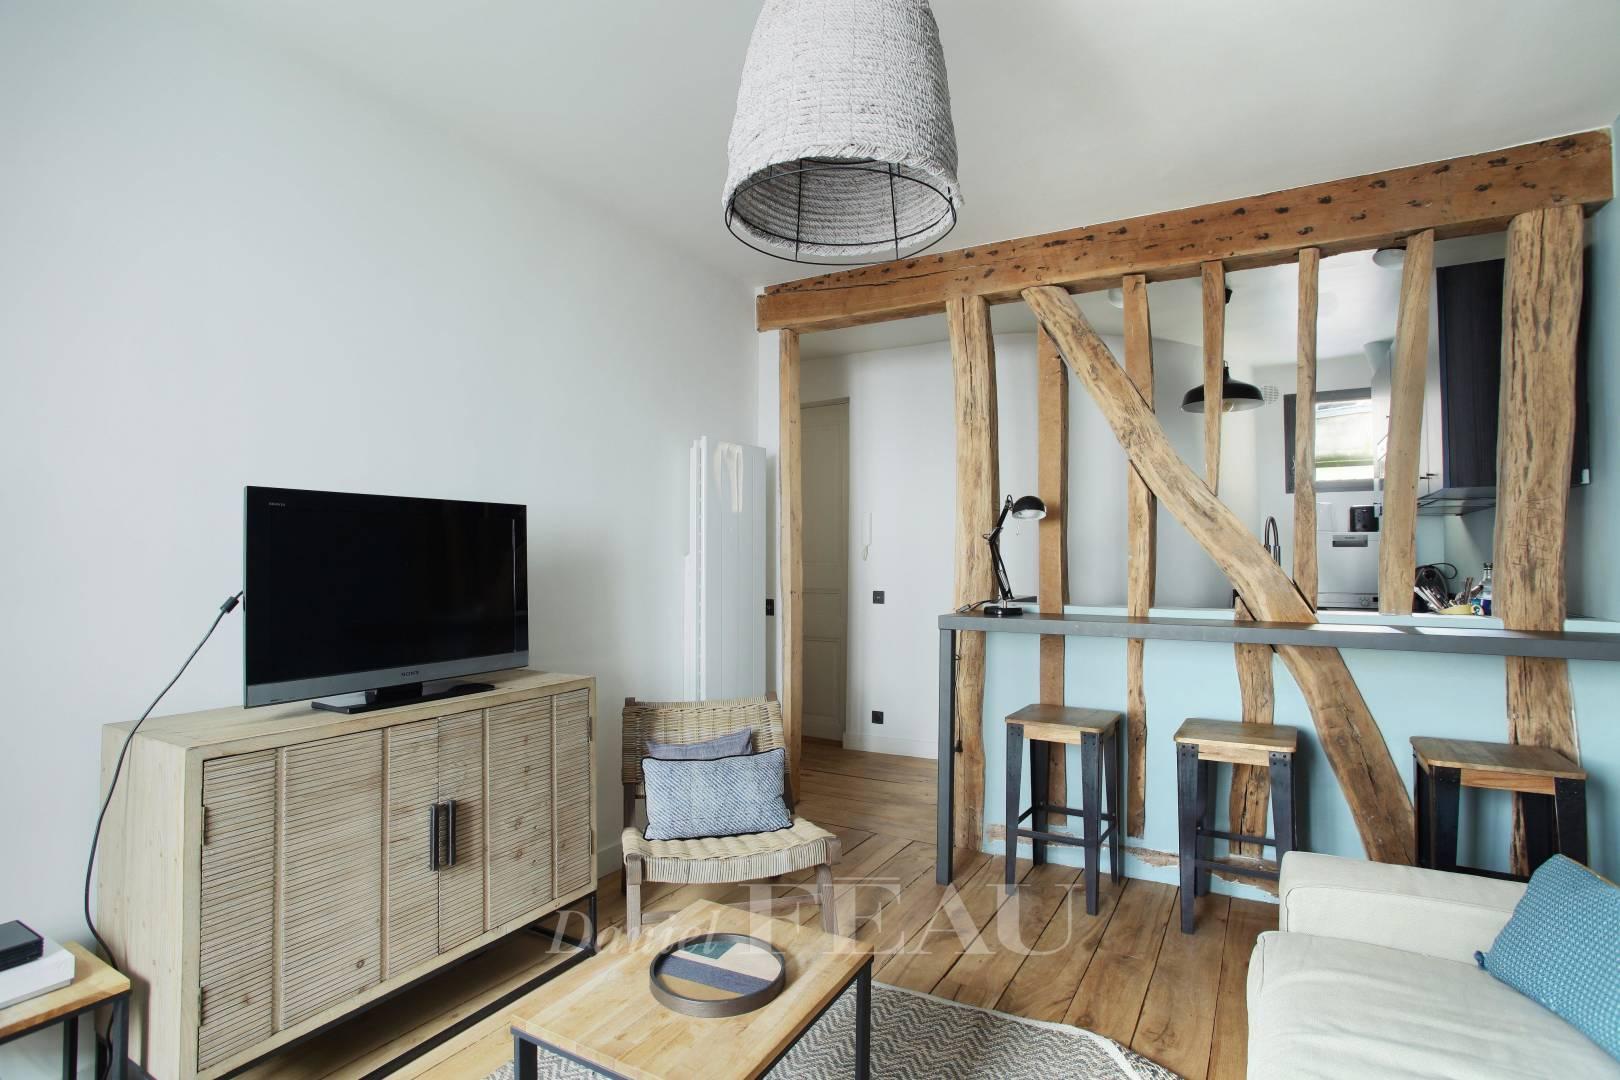 Living-room Wooden floor Kitchen bar High ceiling